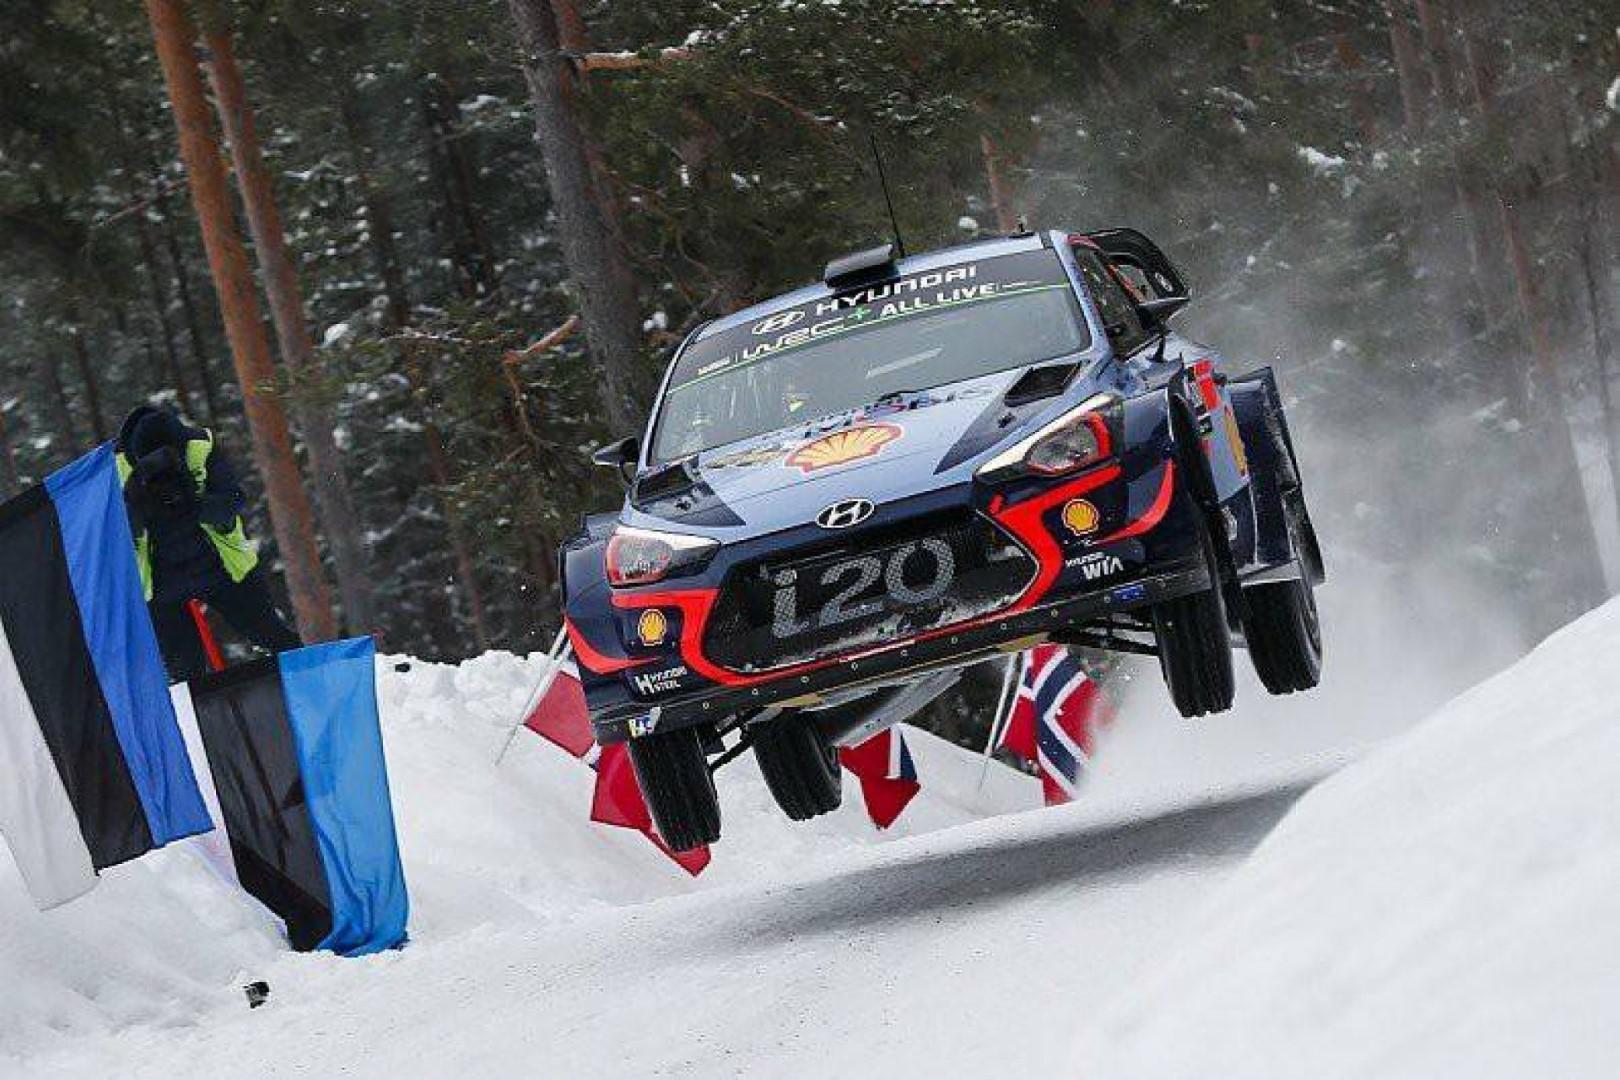 Rallye de Suède 2018 : Thierry Neuville leader du rallye